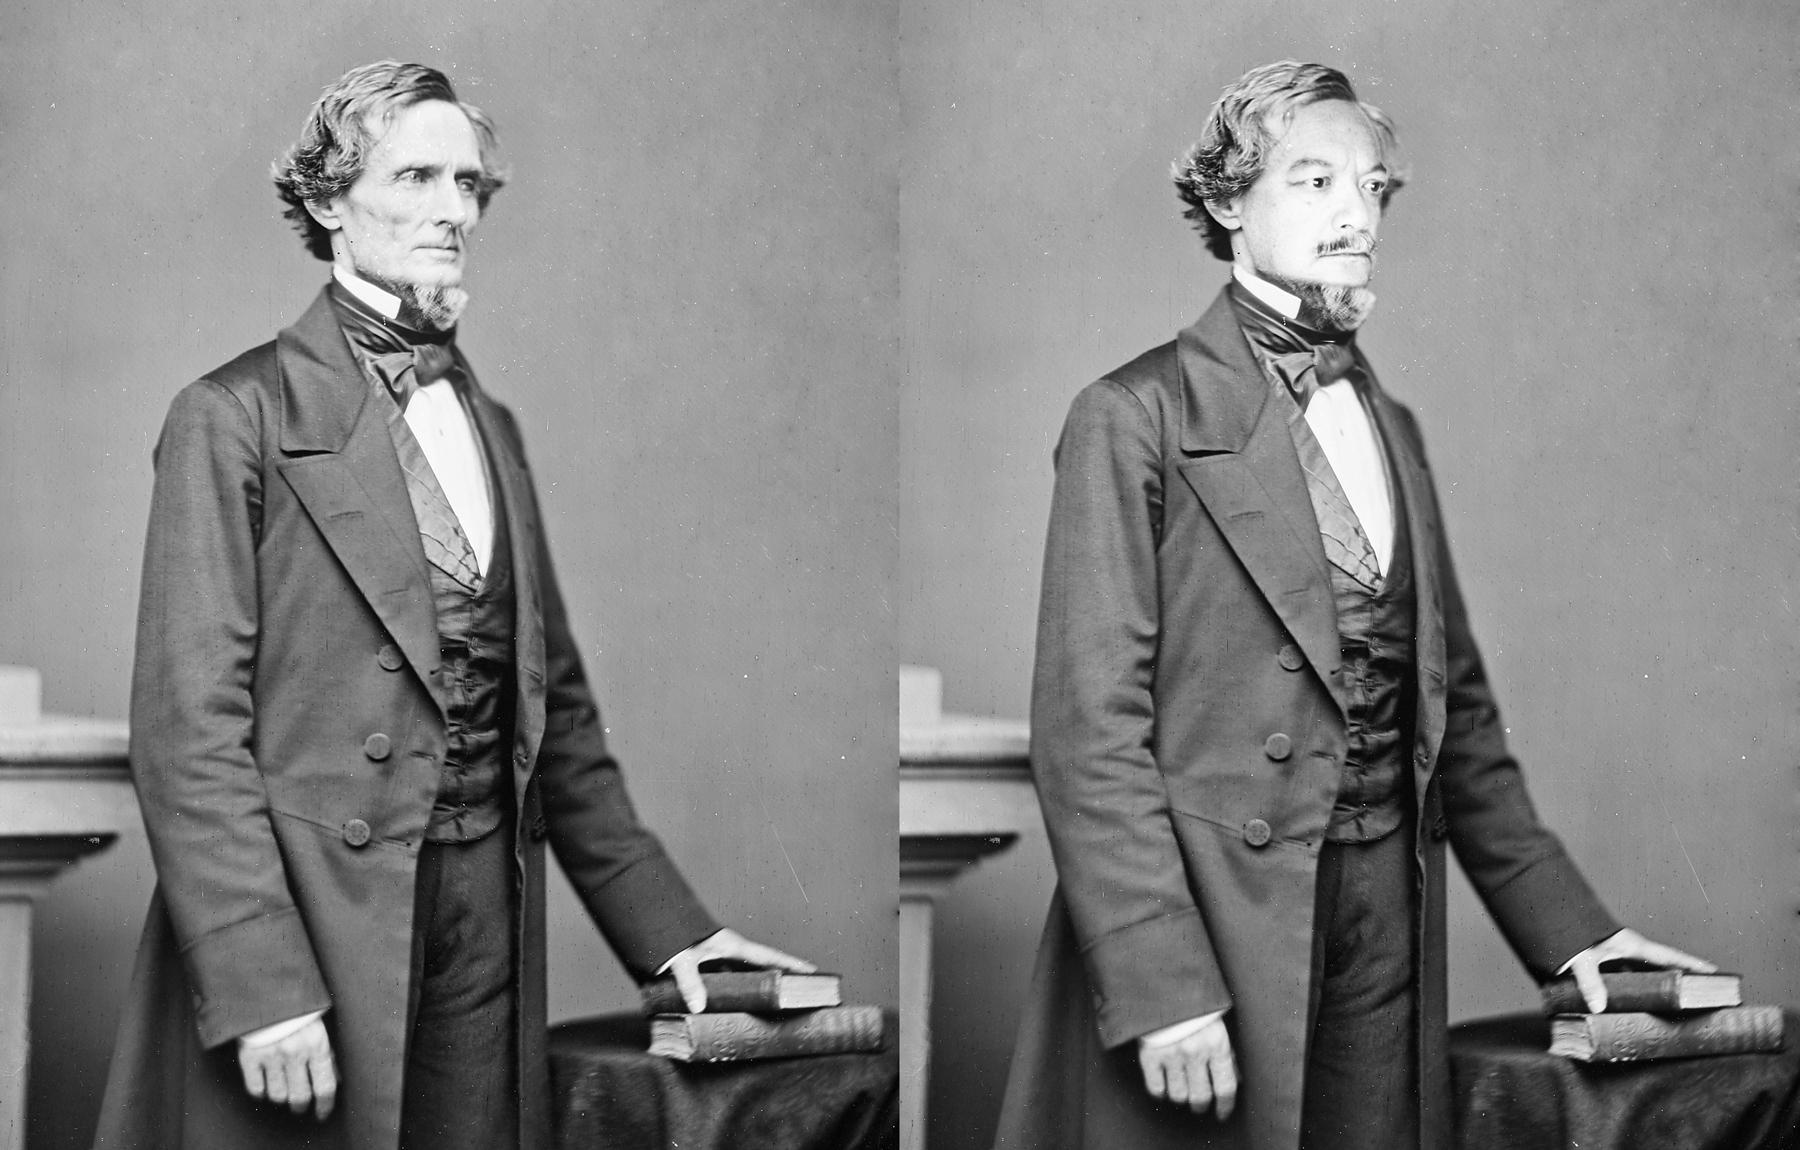 Richard Lou, 2016, the artist as President of the Confederacy Jefferson Davis, stereoscope photo